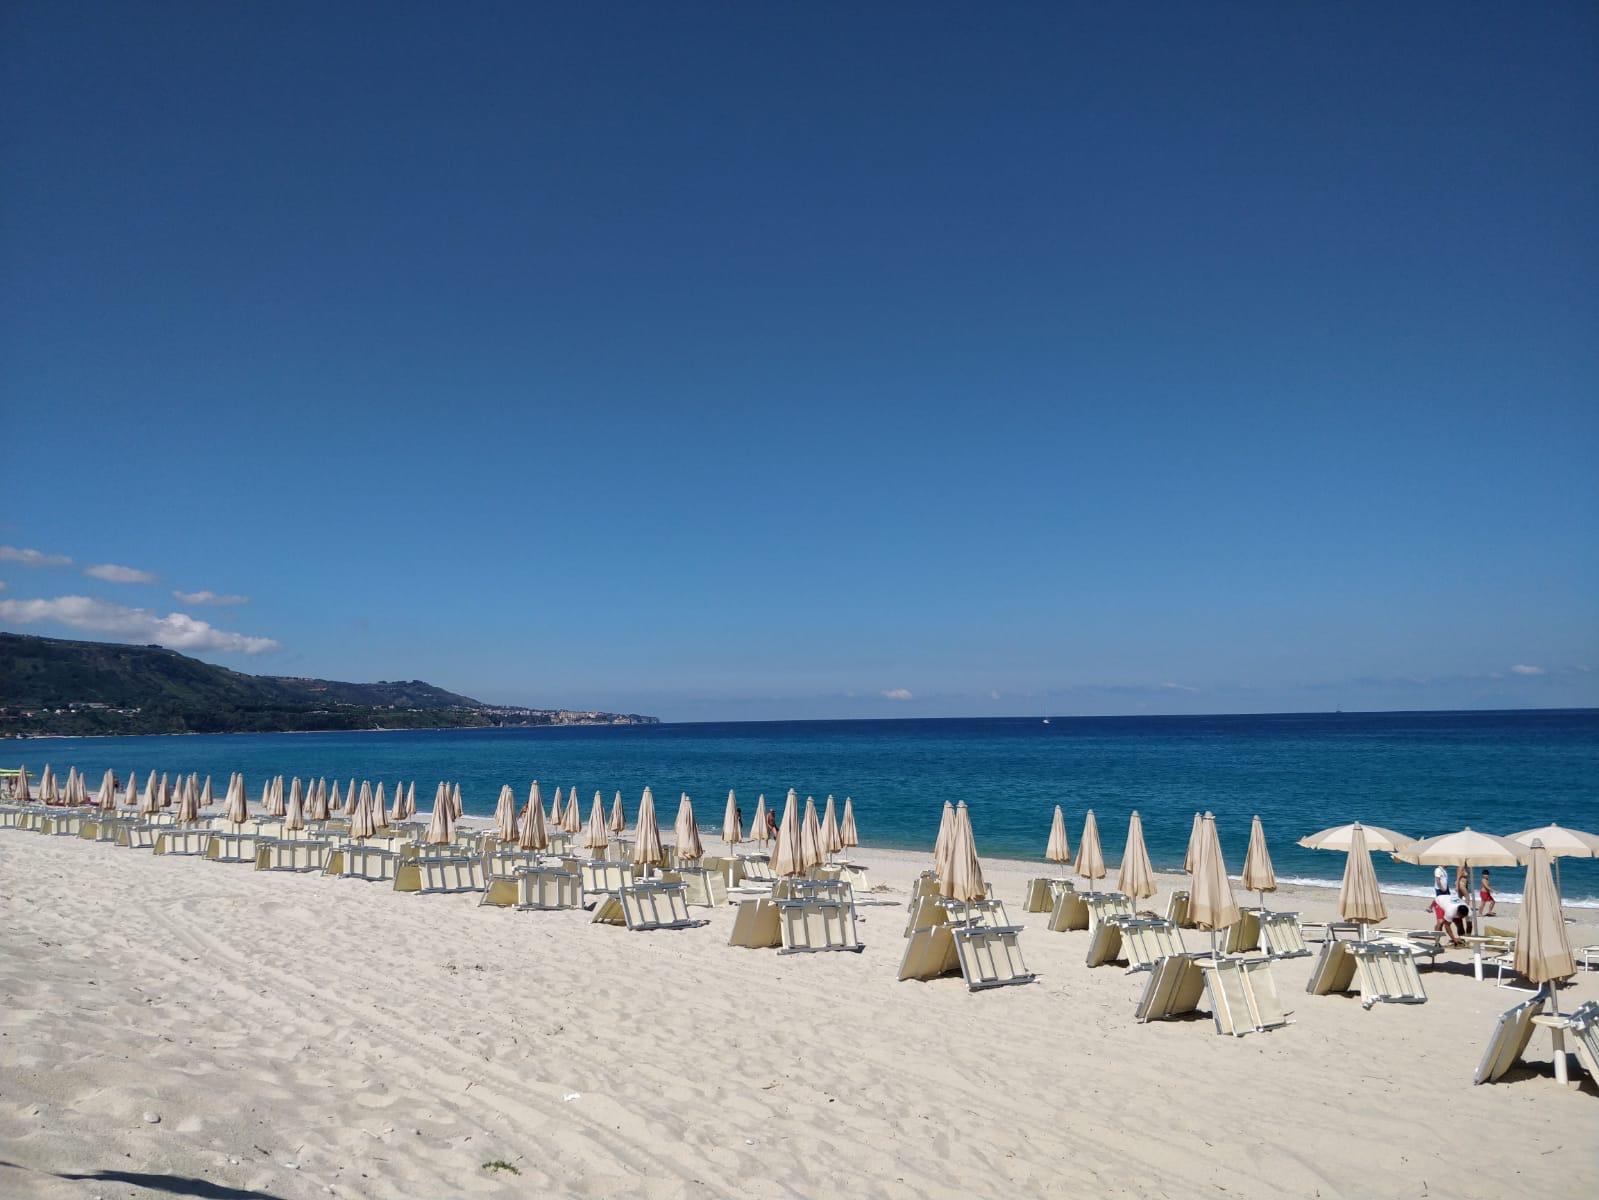 Lido La bianca spiaggia